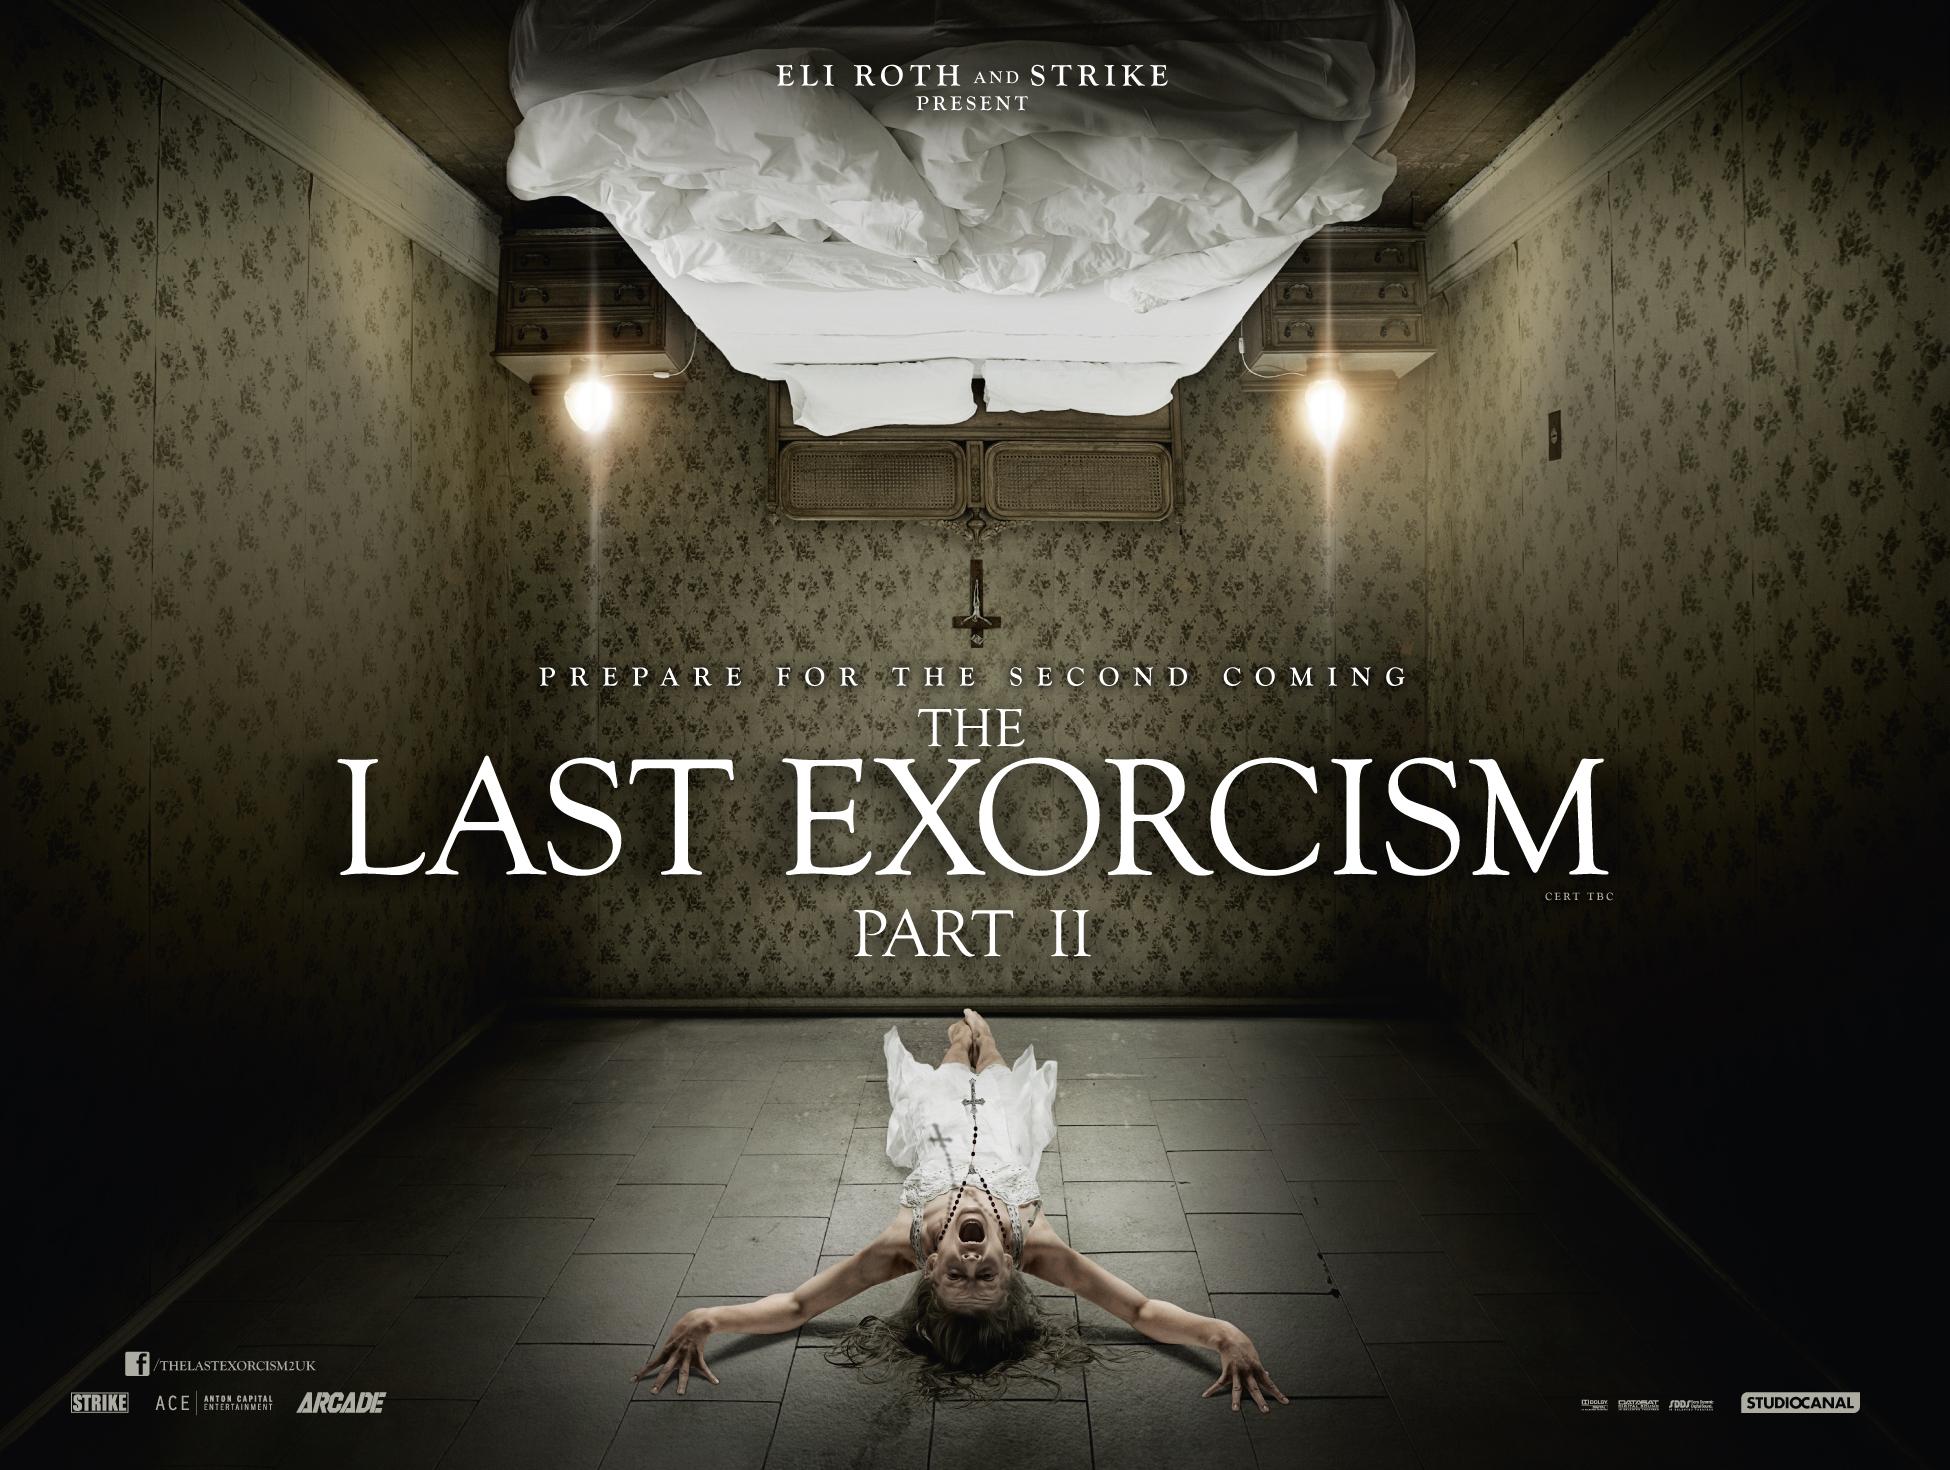 THE LAST EXORCISM 2  Ο ΤΕΛΕΥΤΑΙΟΣ ΕΞΟΡΚΙΣΜΟΣ 4